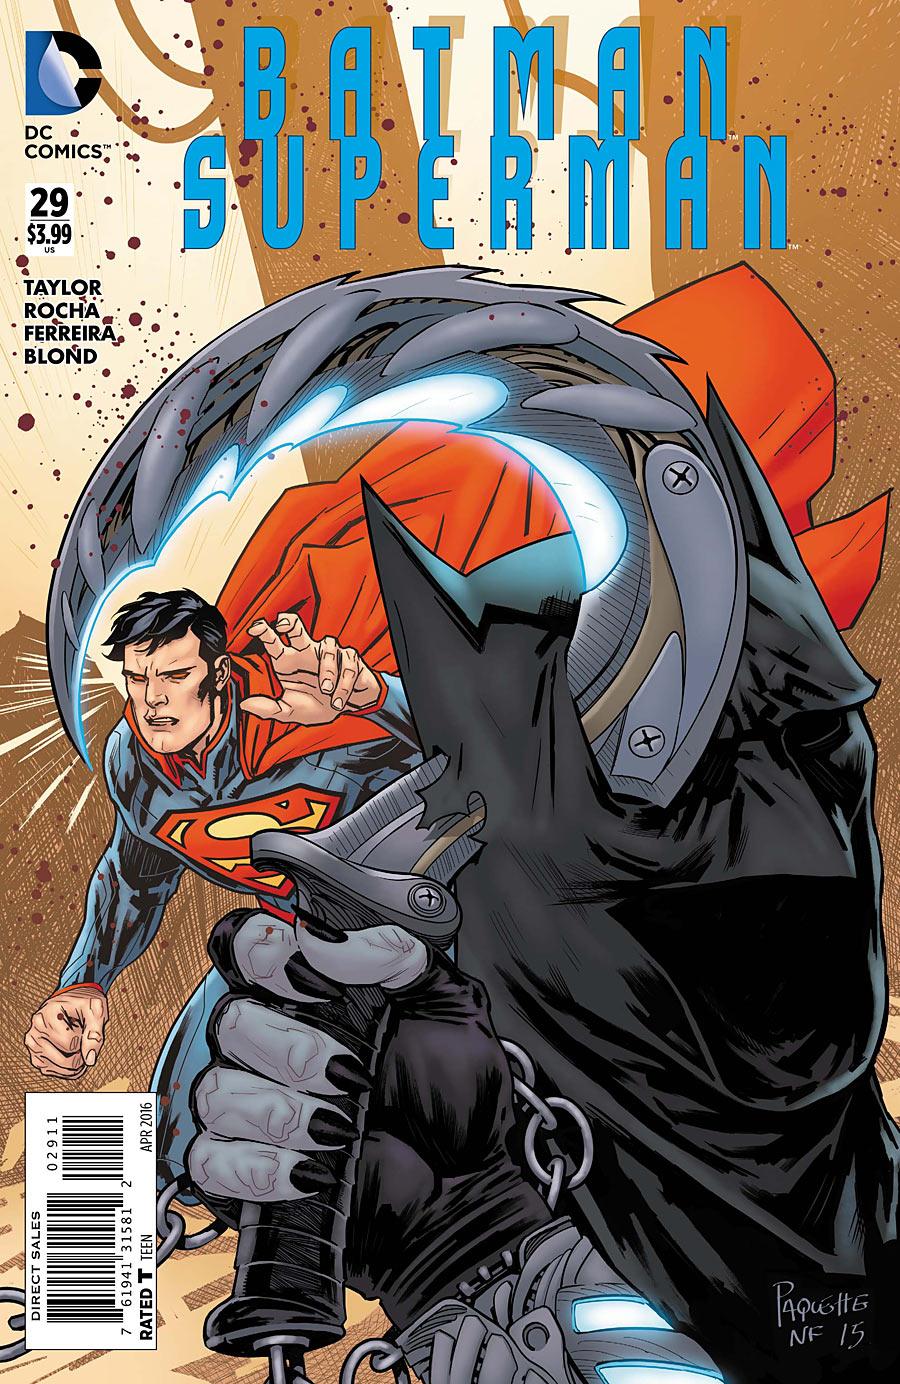 Batman series huntress leandro comics nightwing